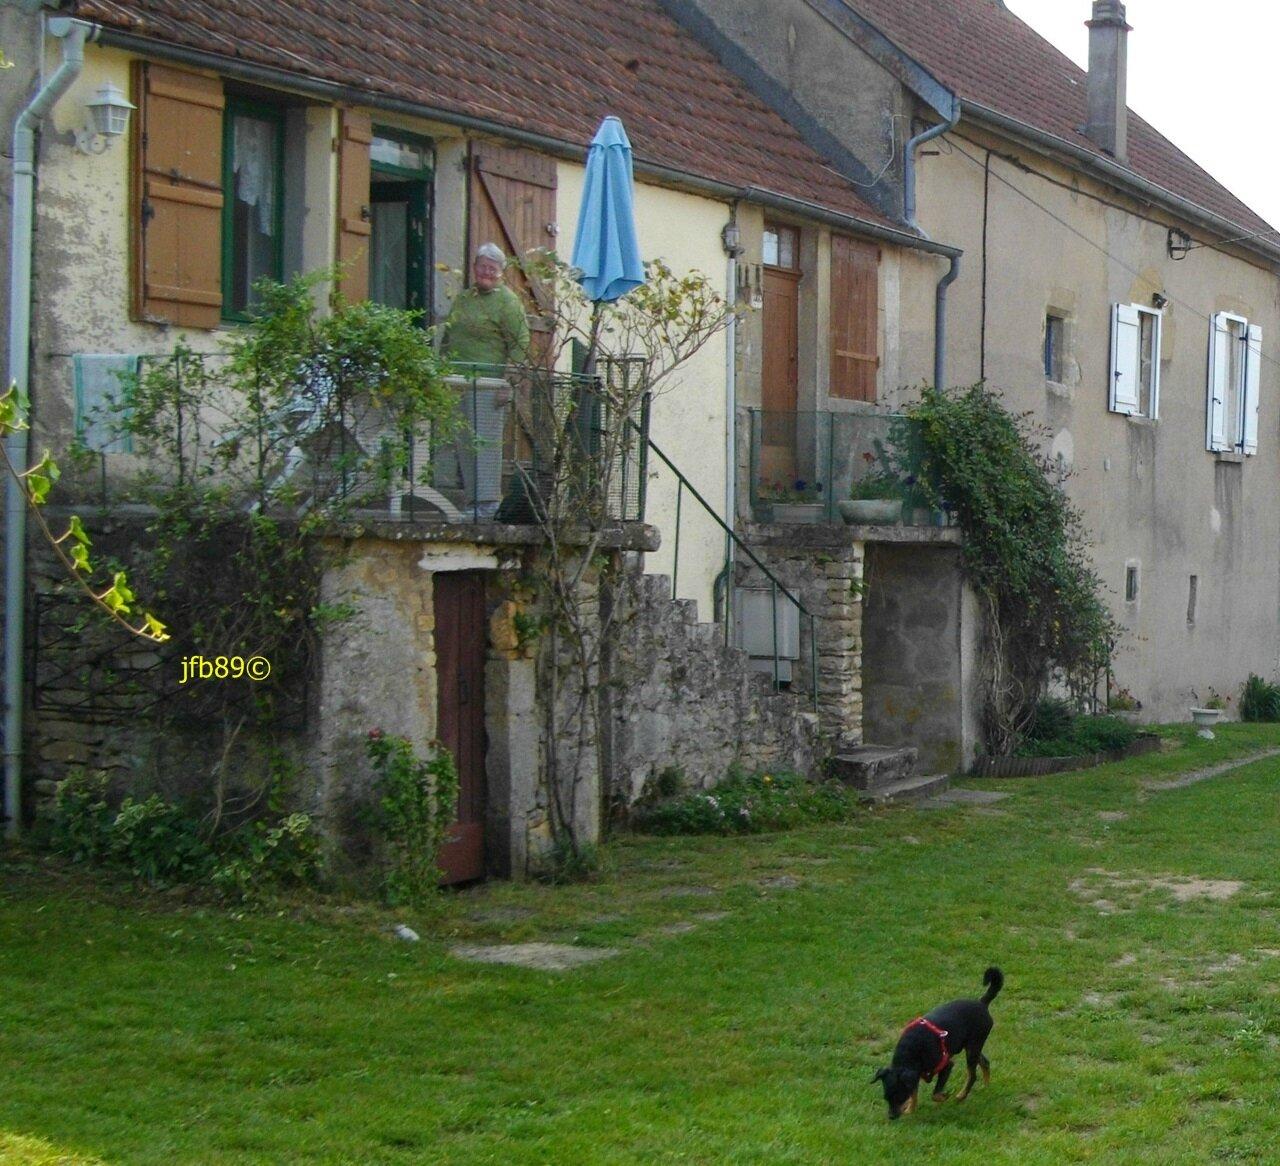 Vacances P Che Dans Le Morvan En Octobre 2014 Mes